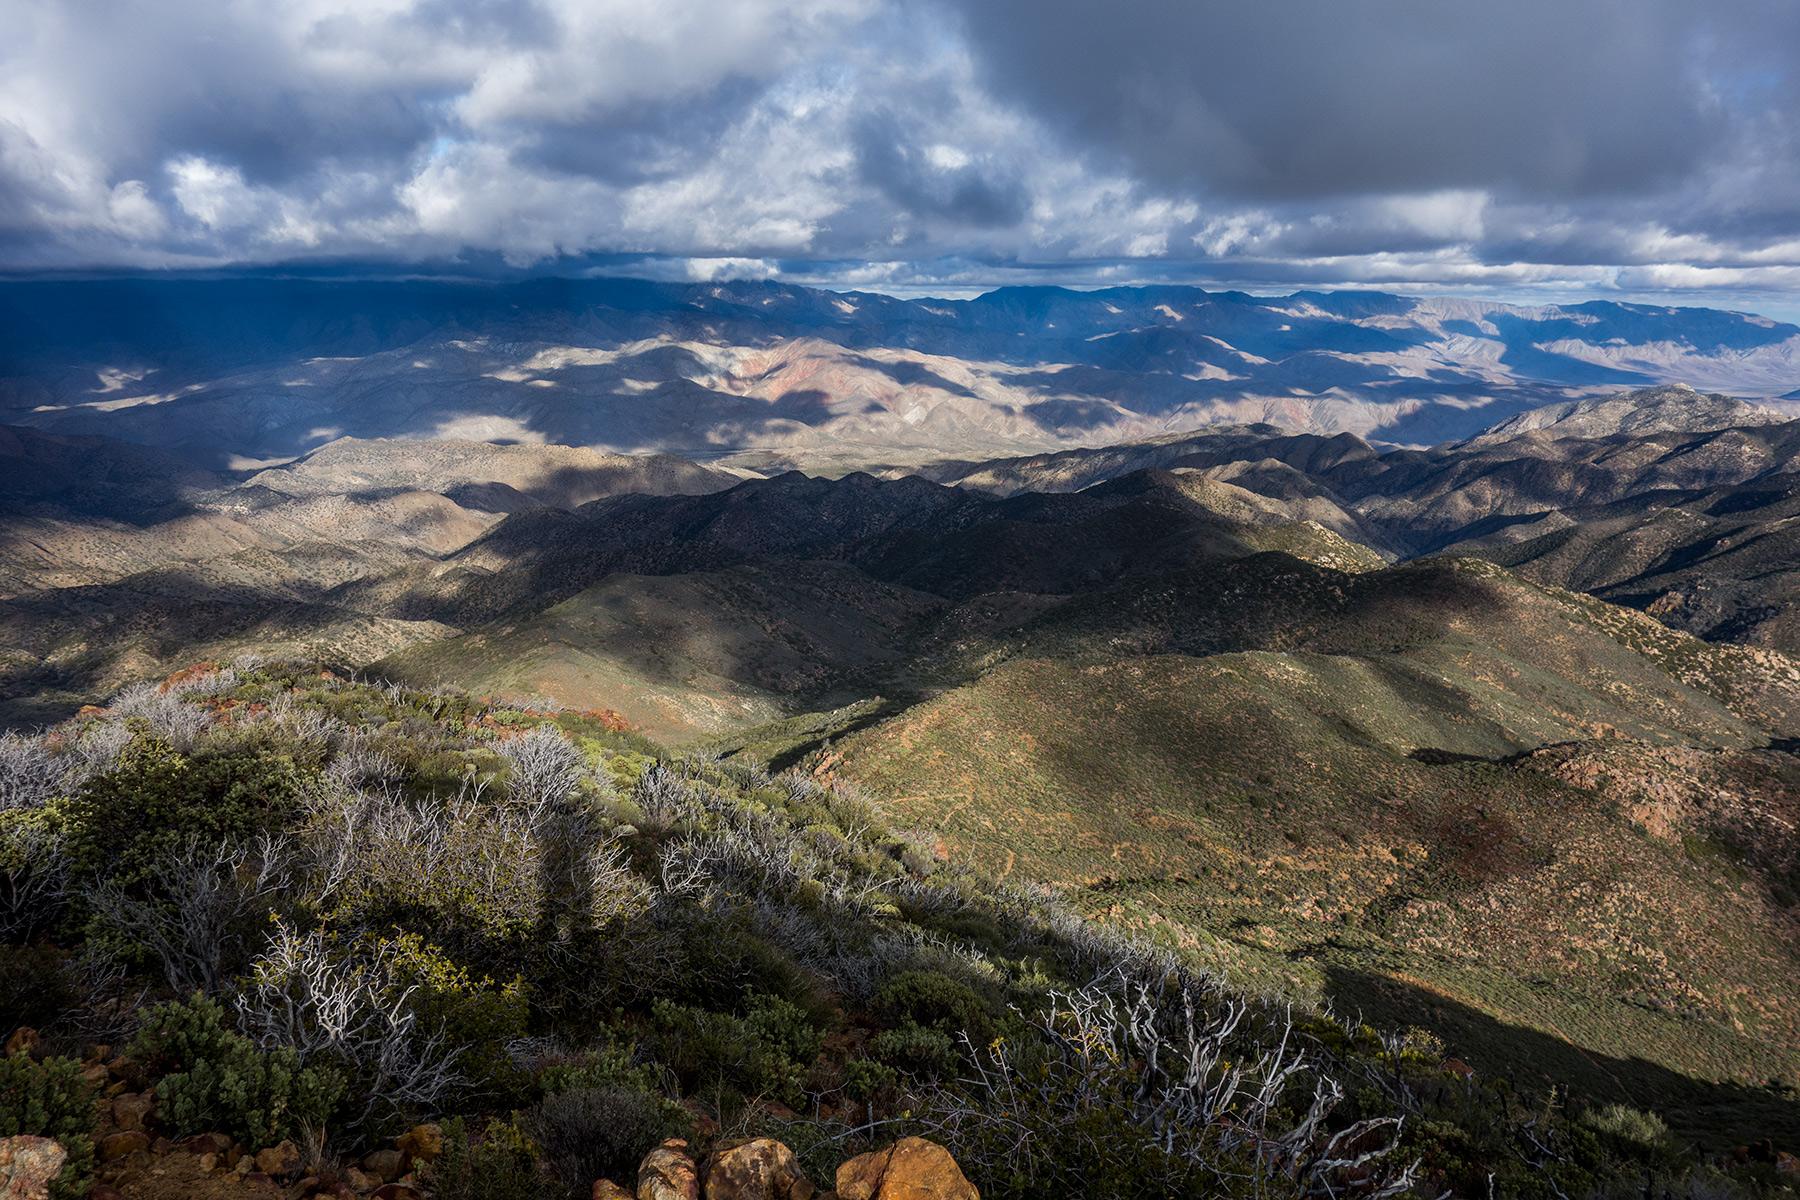 Combs Peak – Photo Gallery